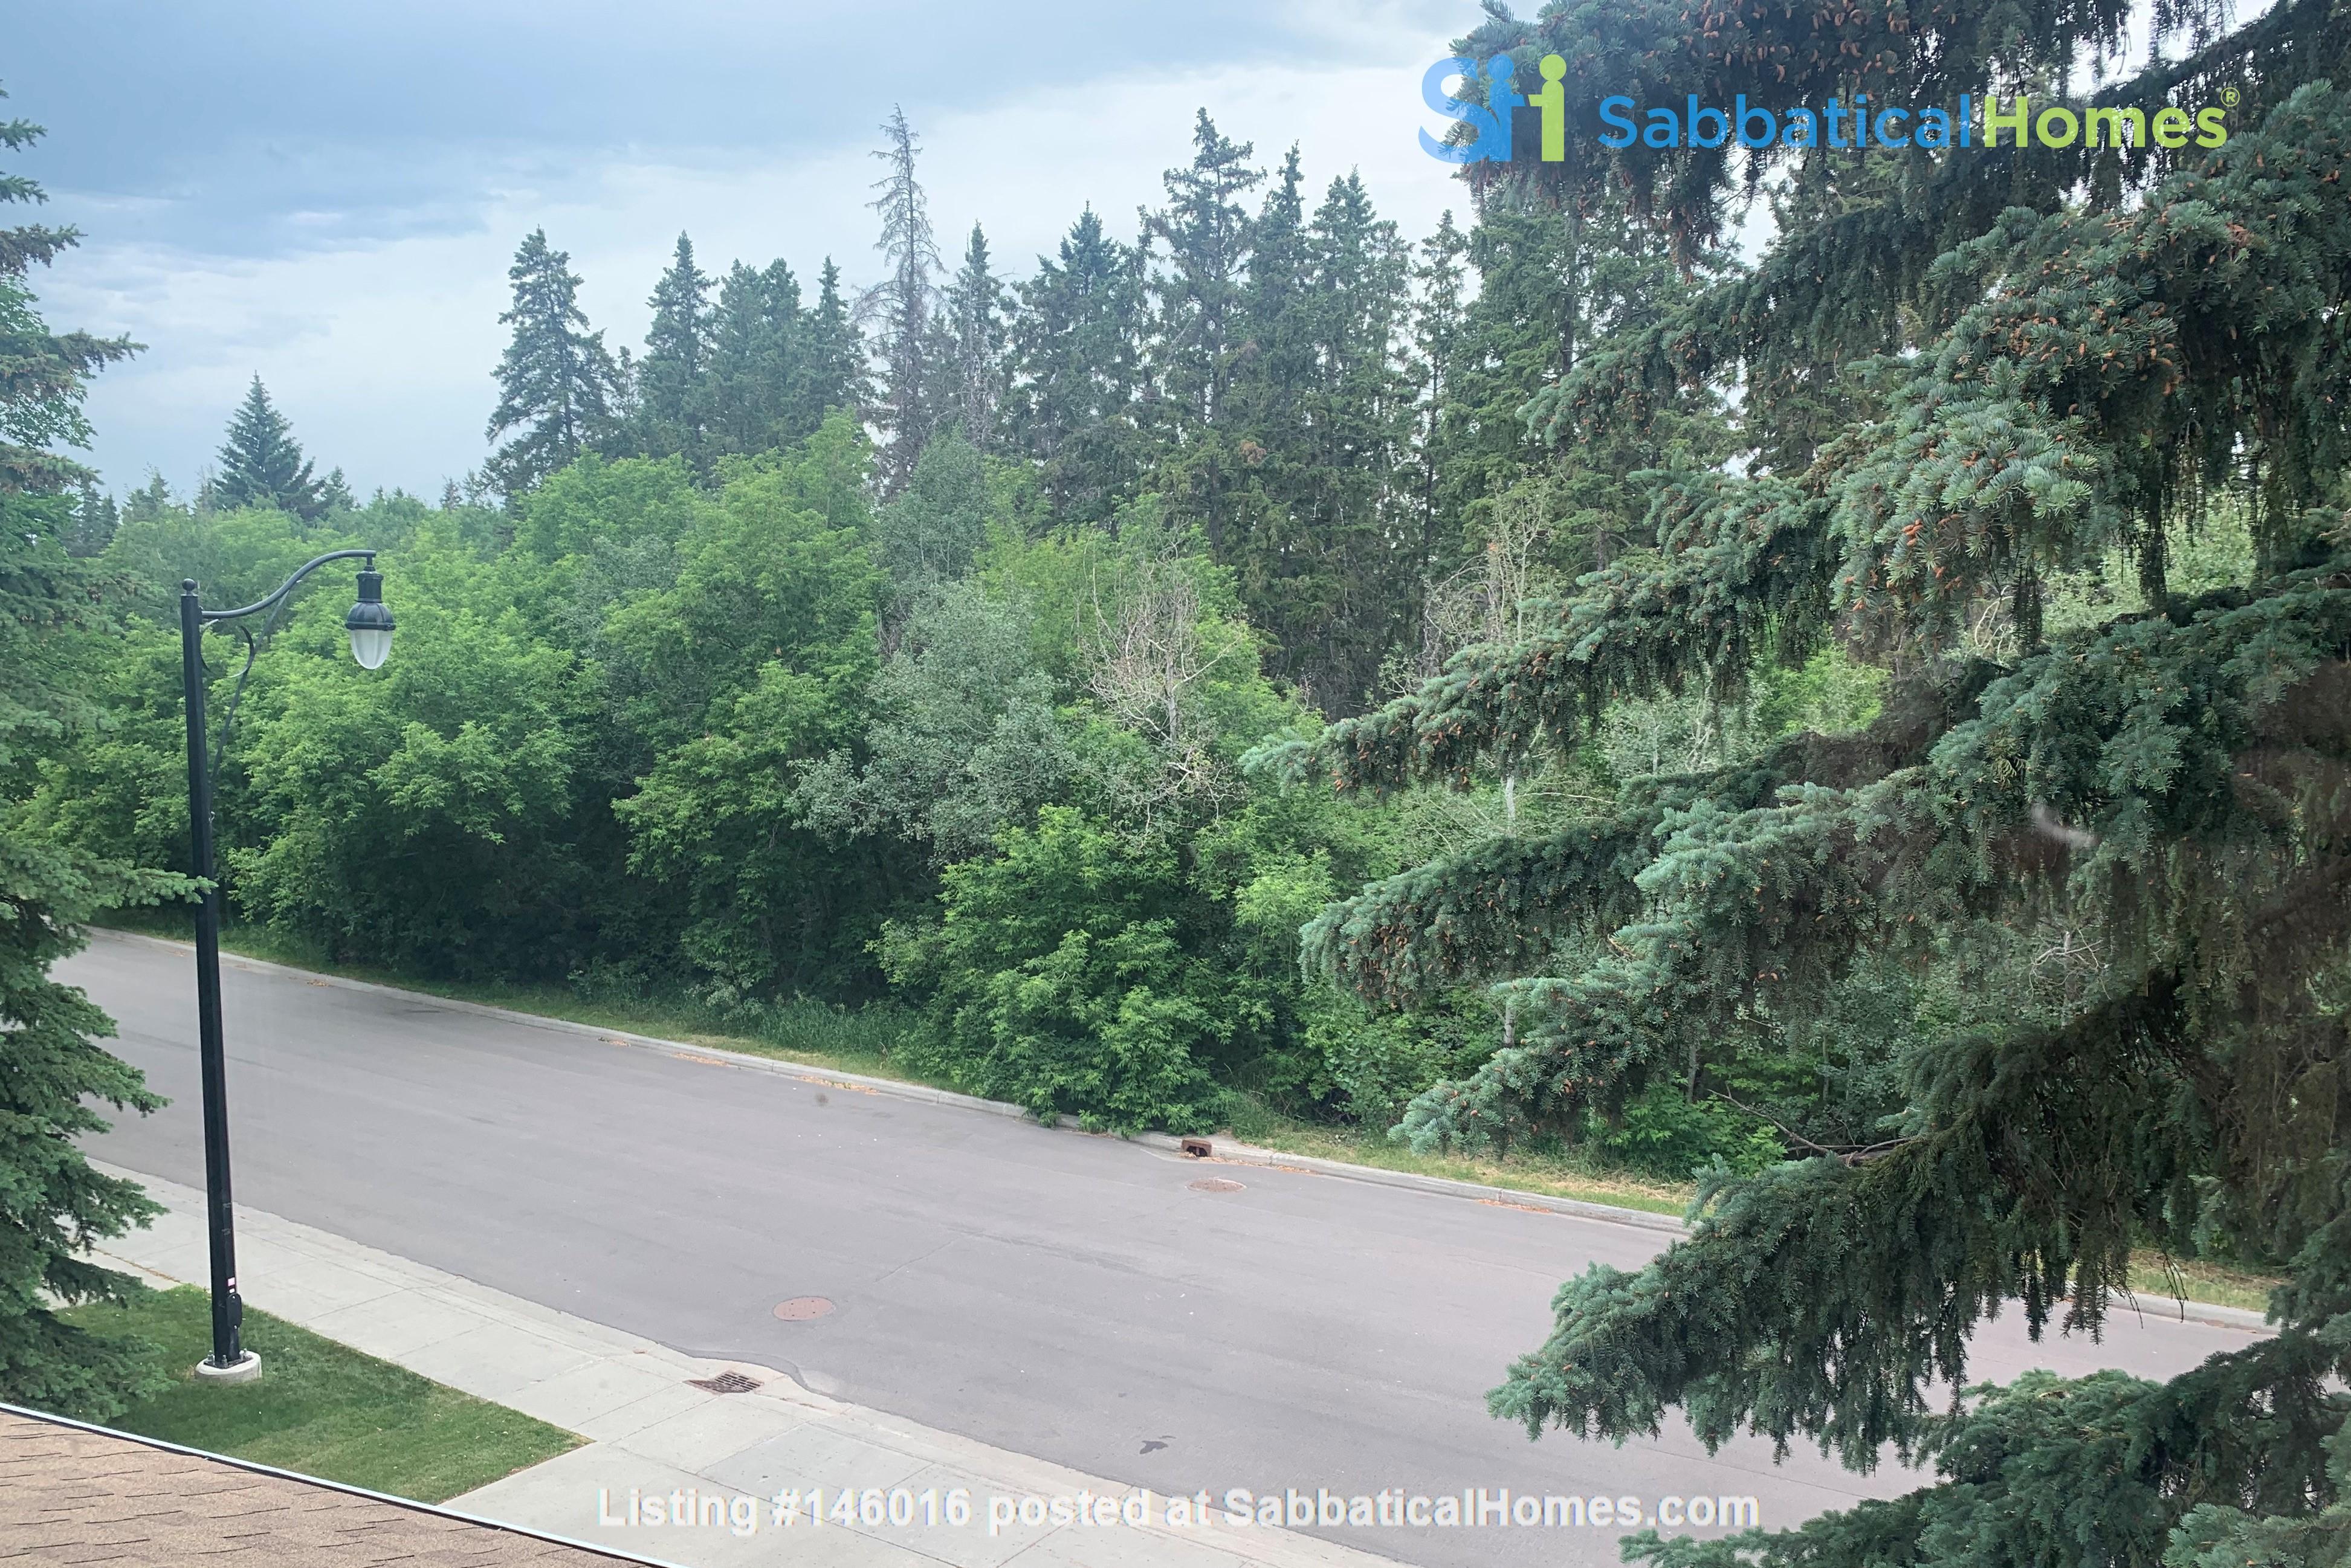 Forest haven sabbatical home Home Rental in Edmonton 0